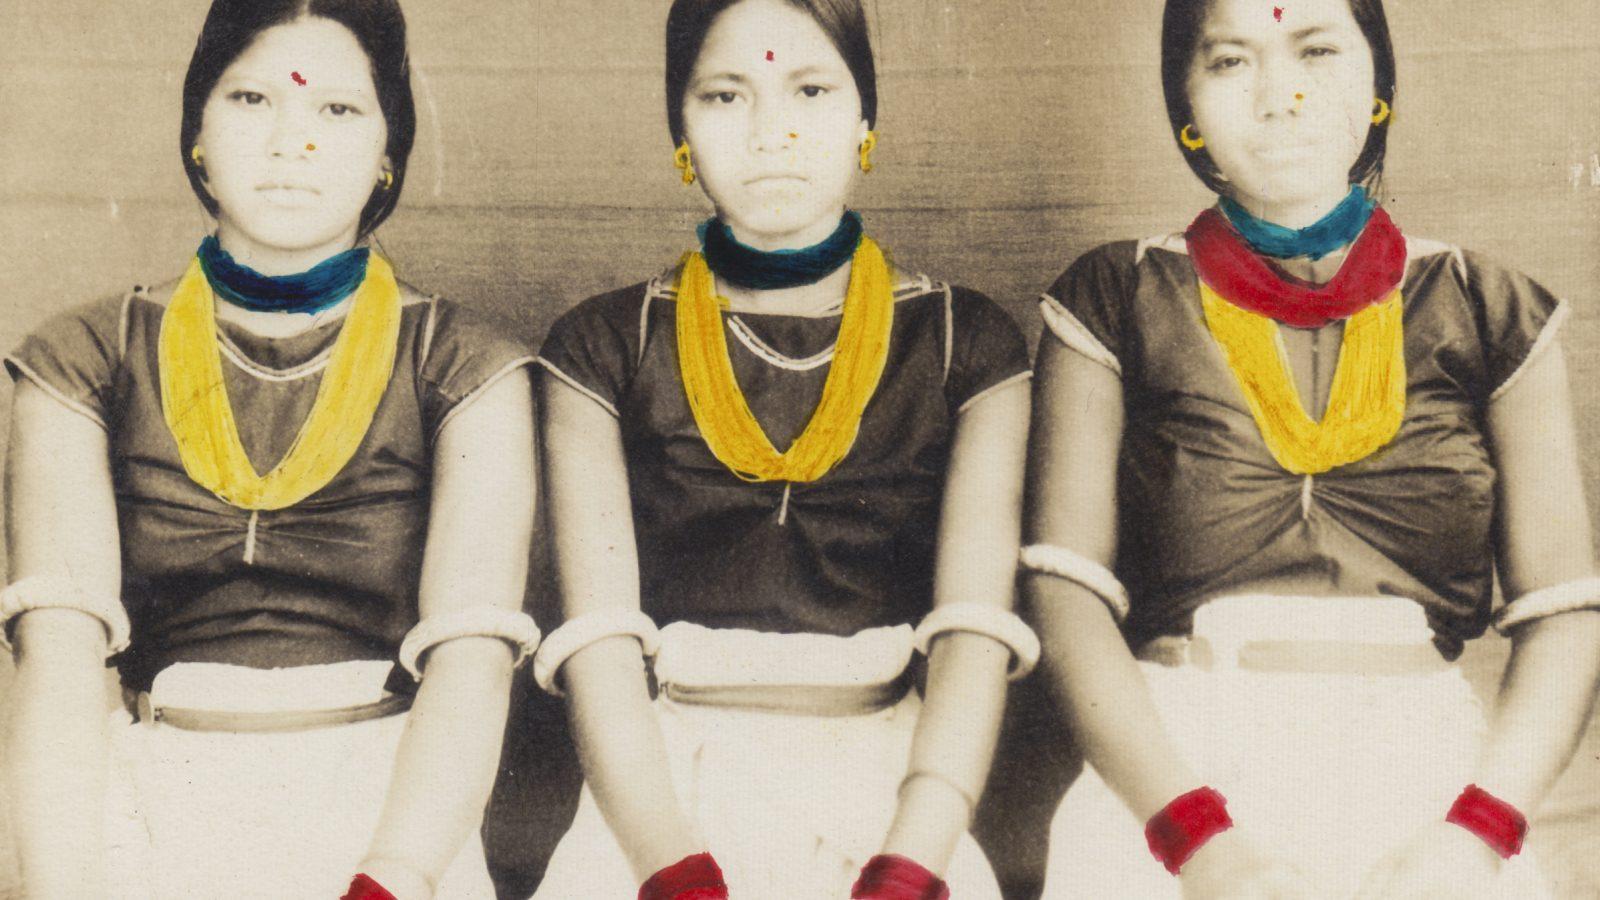 Courtesy of Nepal Photo Library